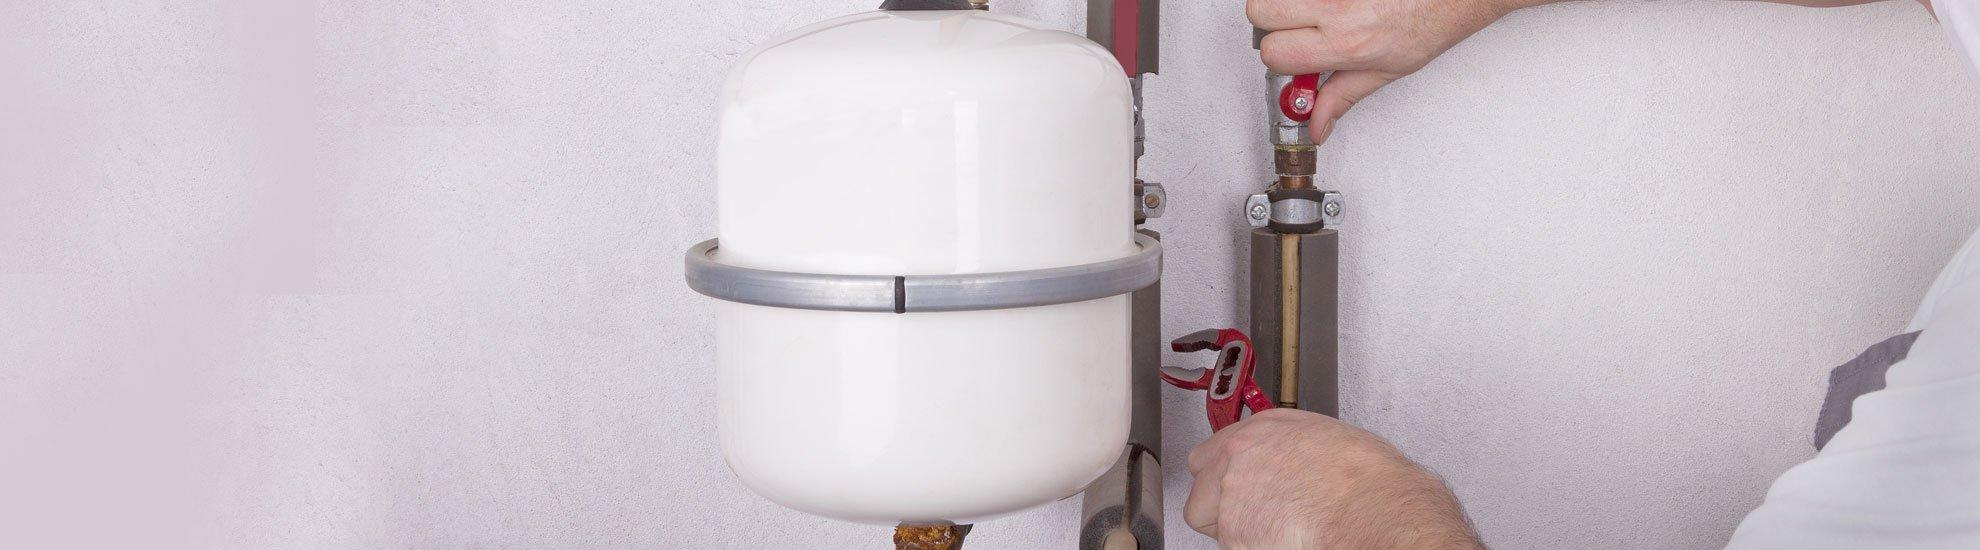 Reliable boiler installation